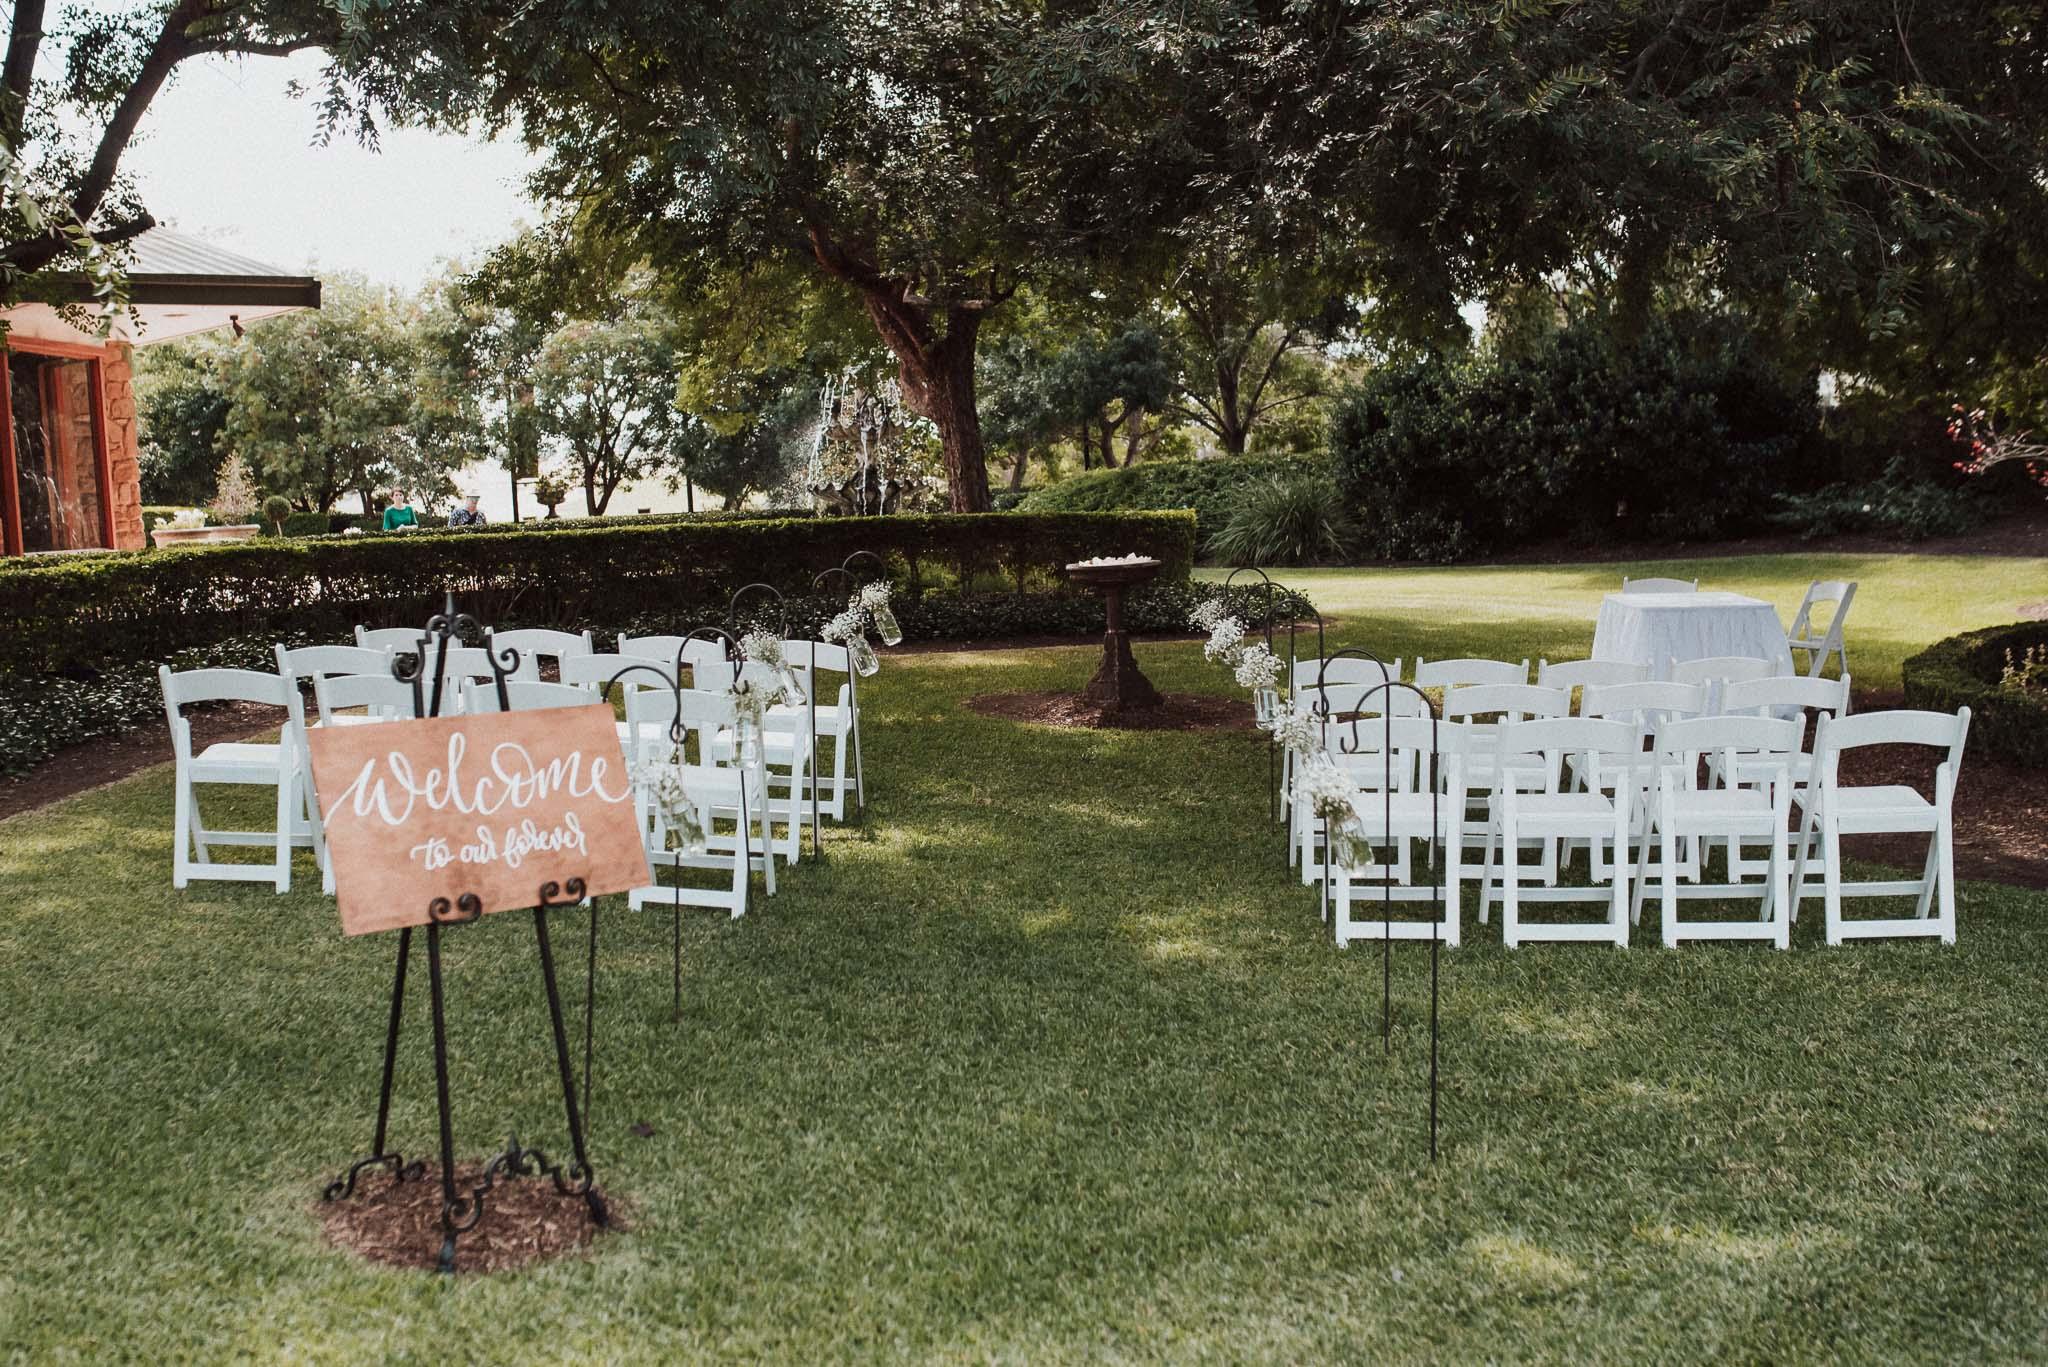 MECURE-RESORT-WEDDING-KING-WEB-6.jpg